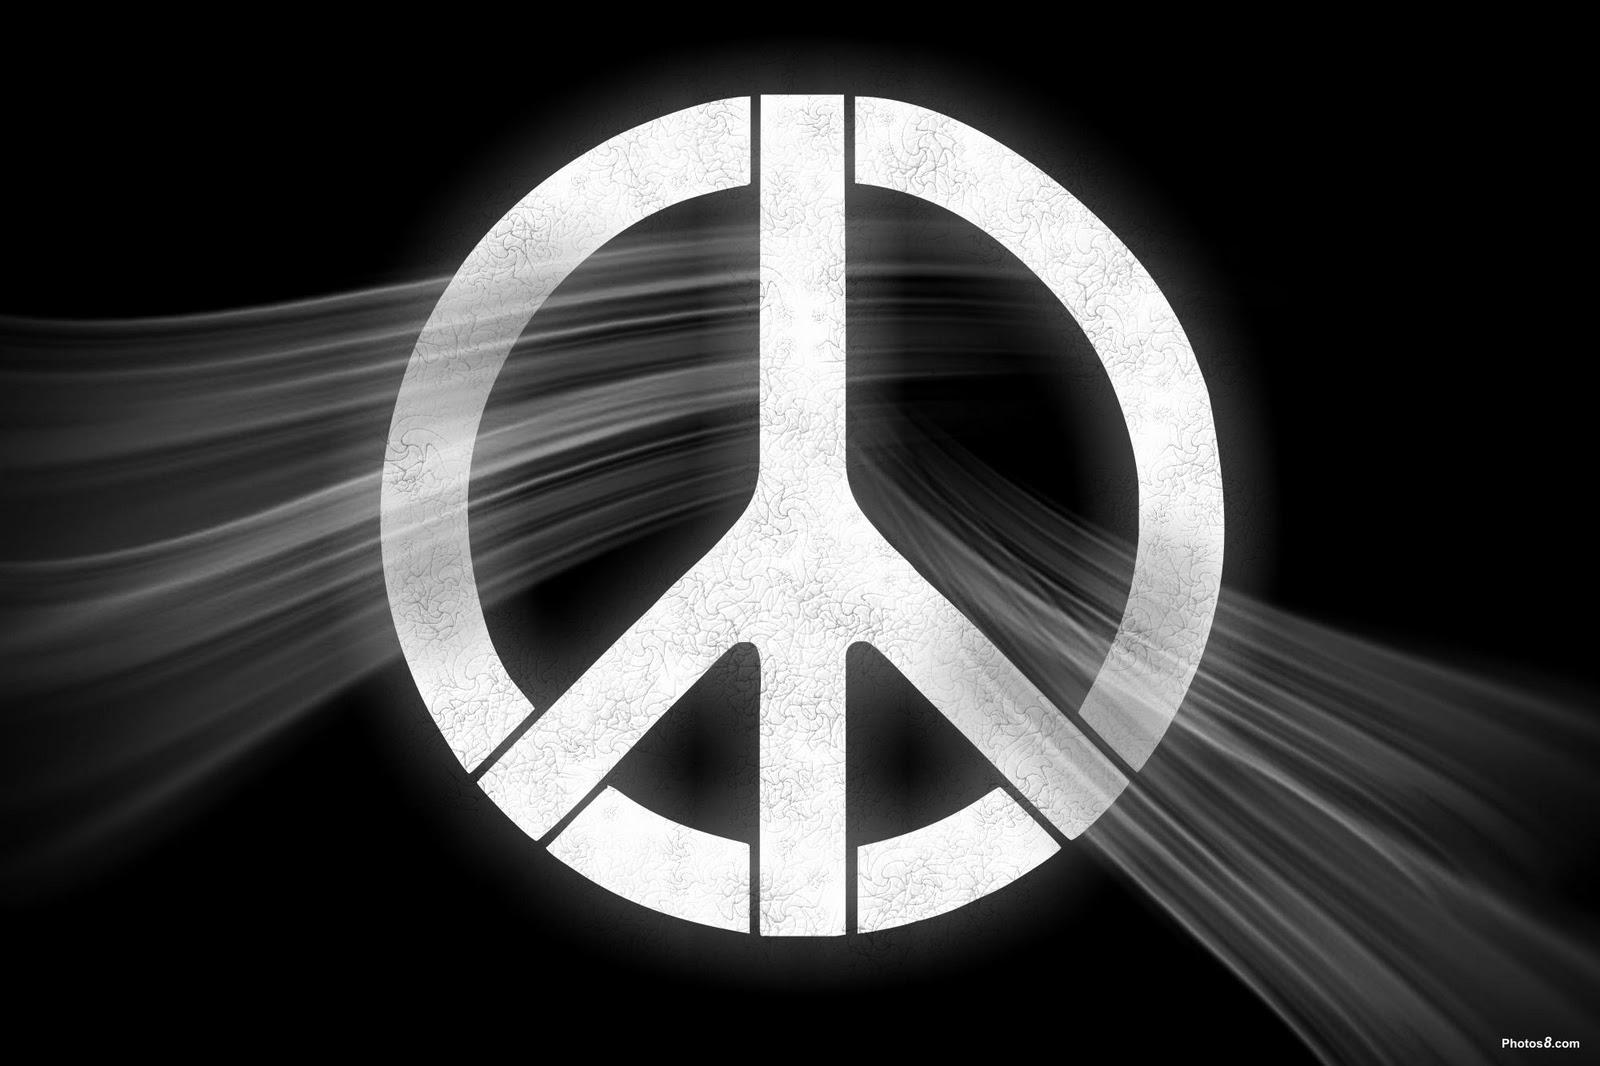 Harmony Of The Heart A Season For Nonviolence Reflections Week 8